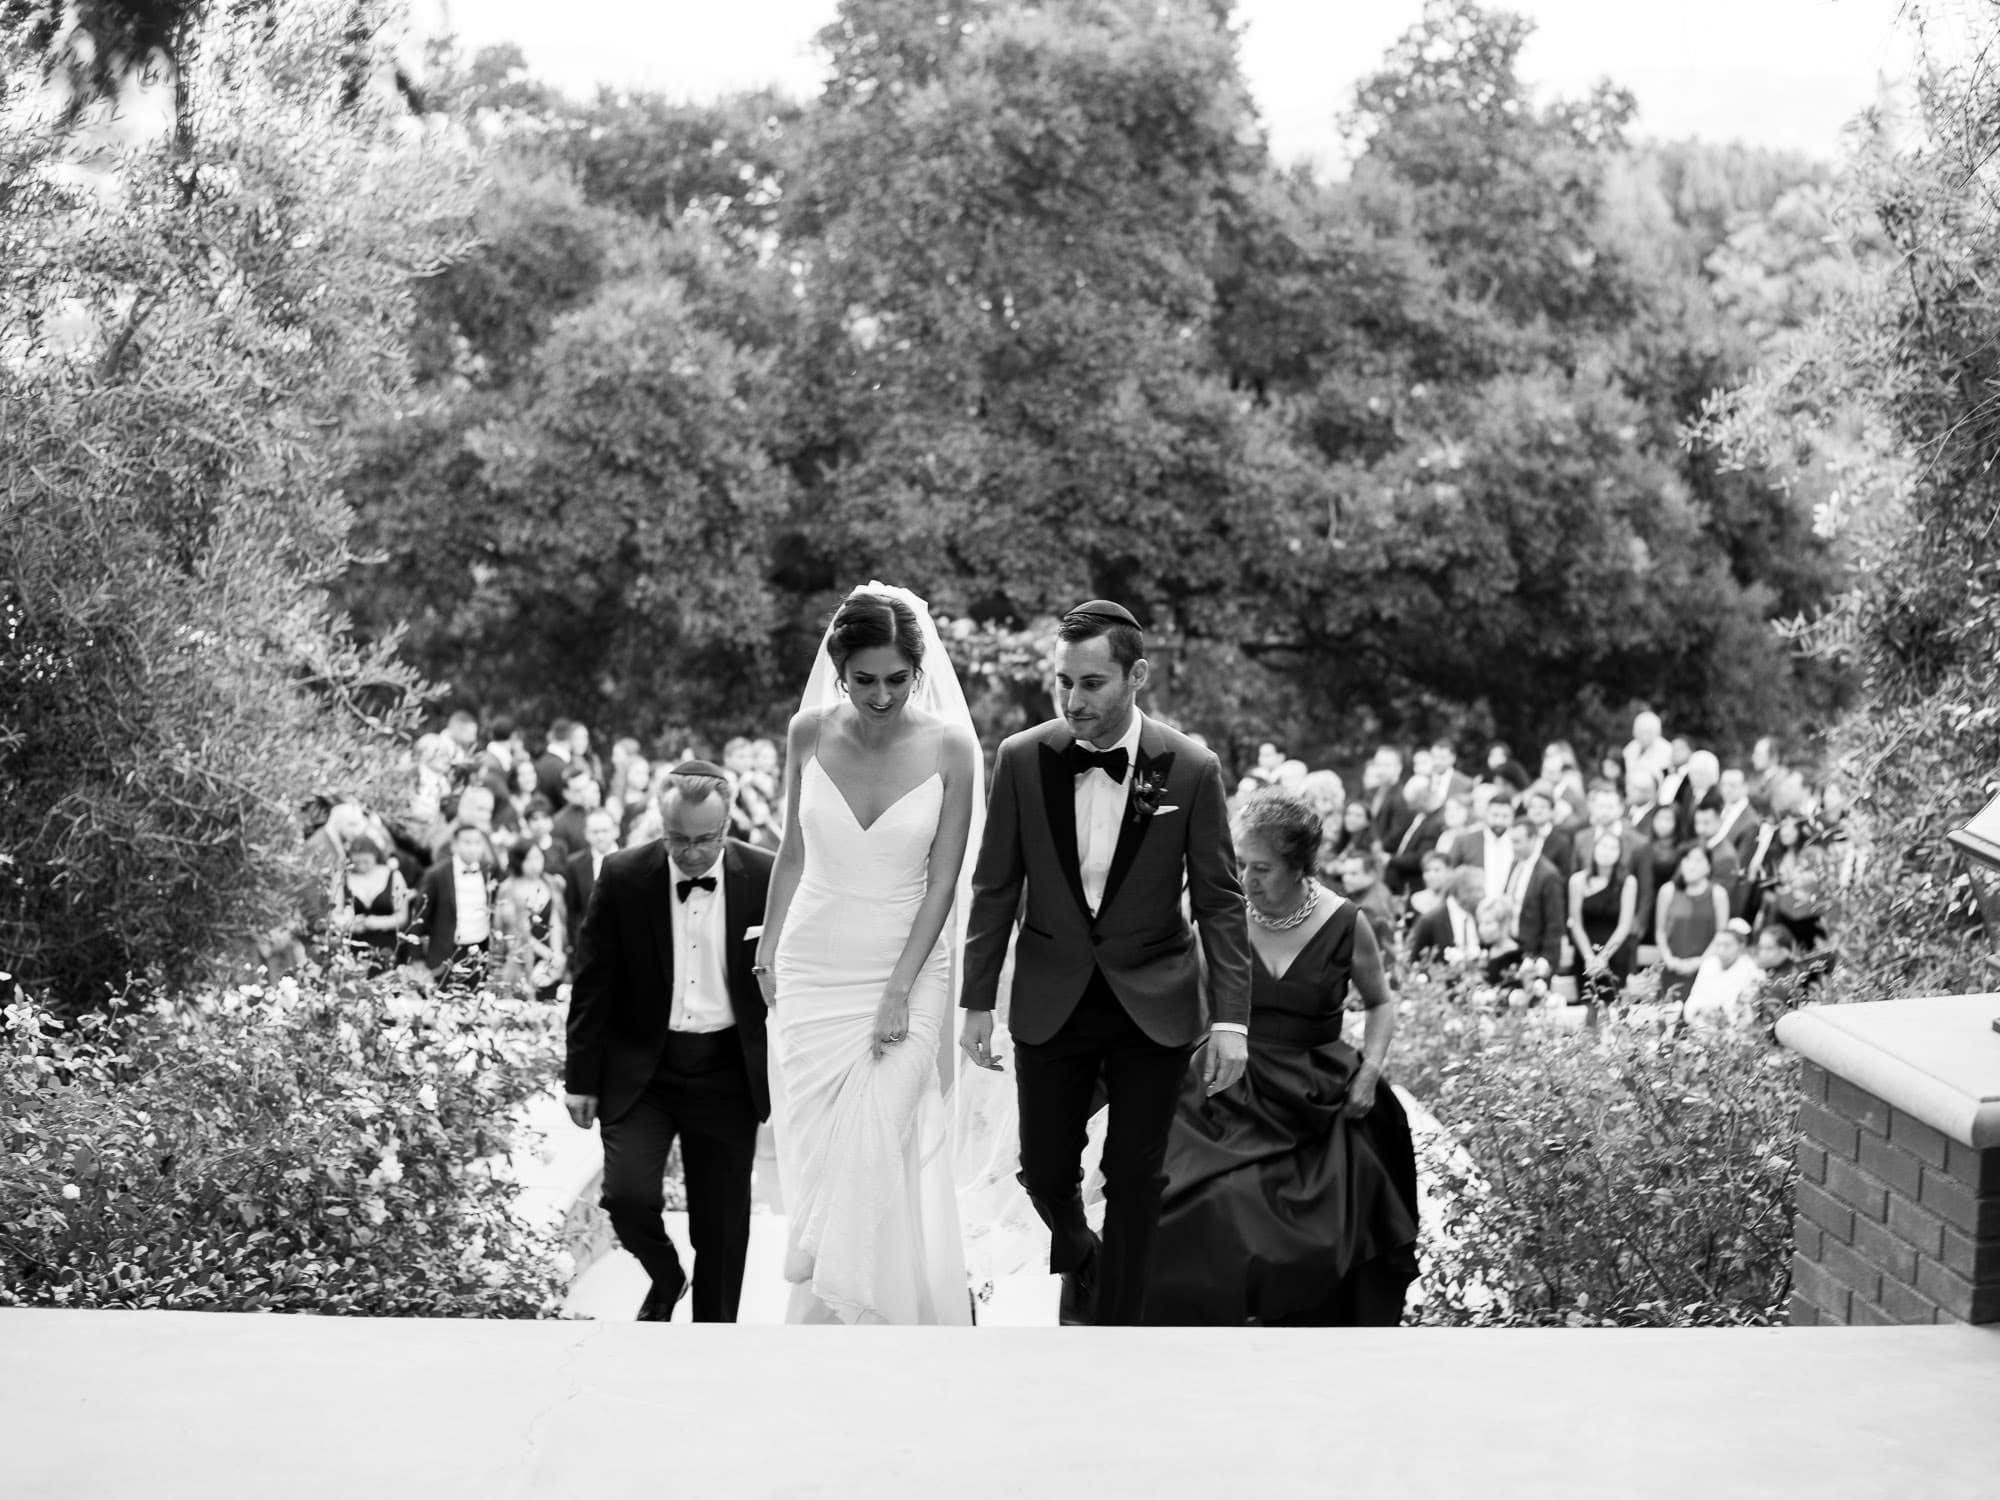 Wedding-Photo-Inspiration-Greg-Ross